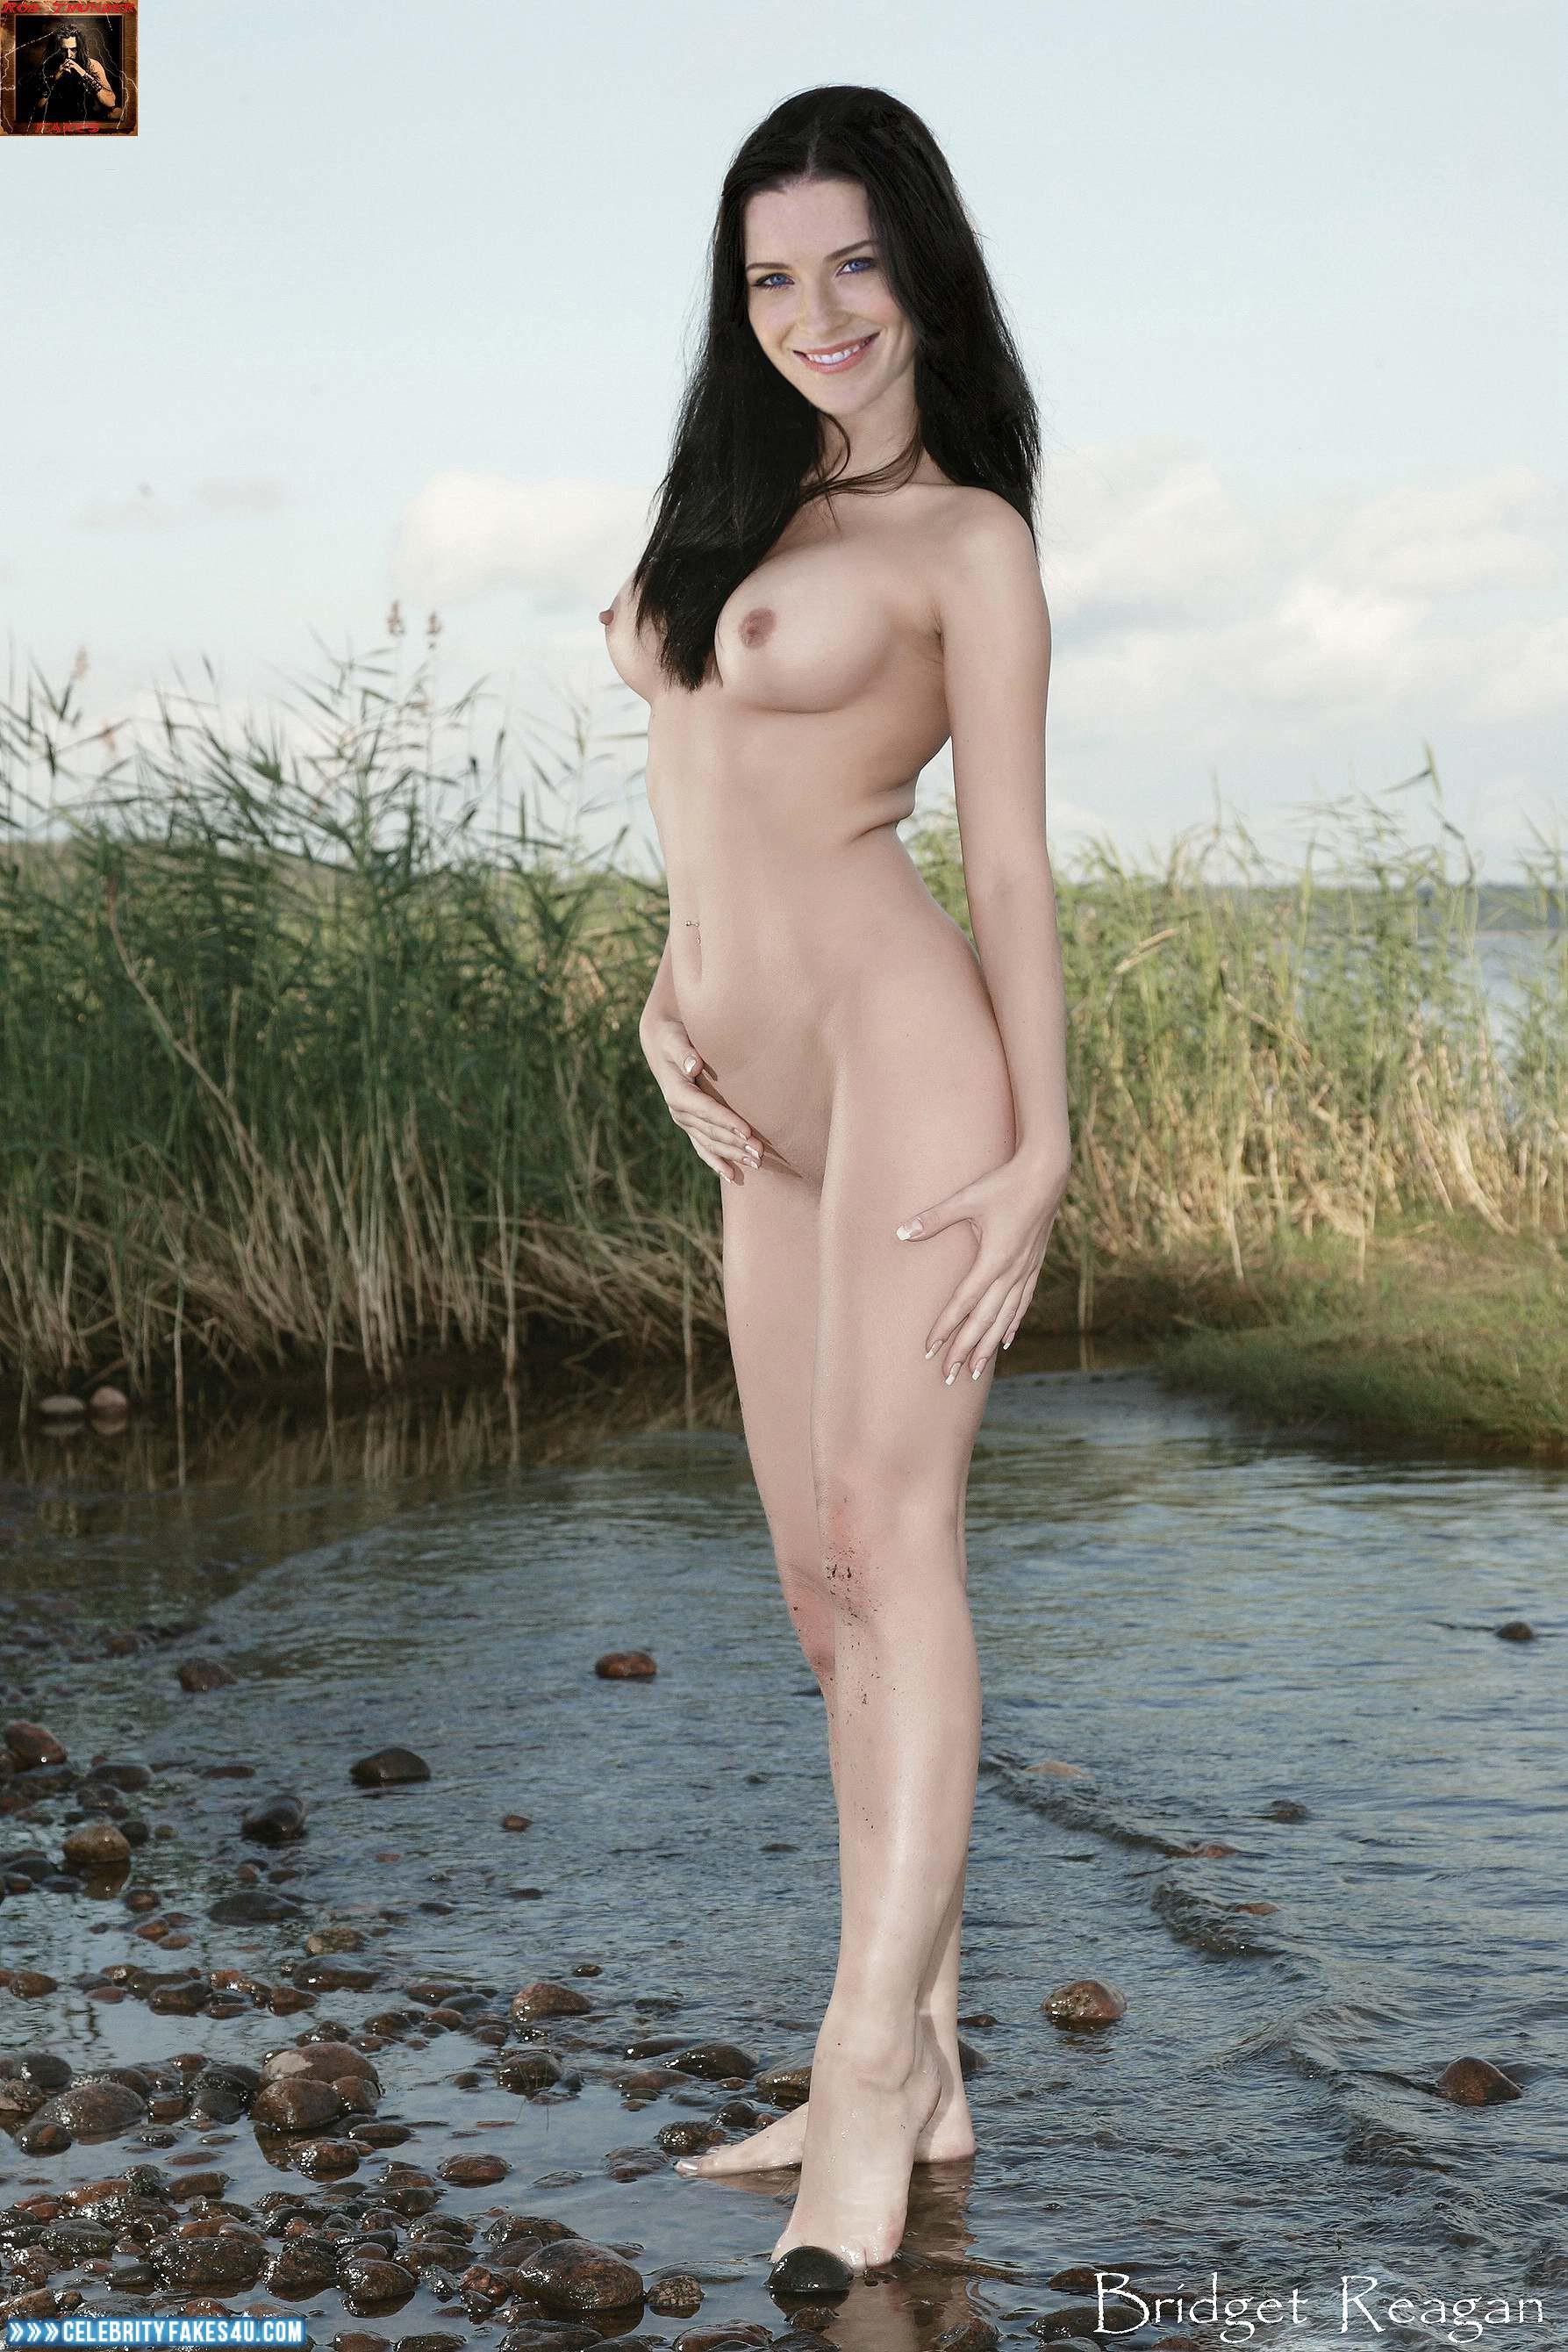 Bridget regan fake nude brilliant idea